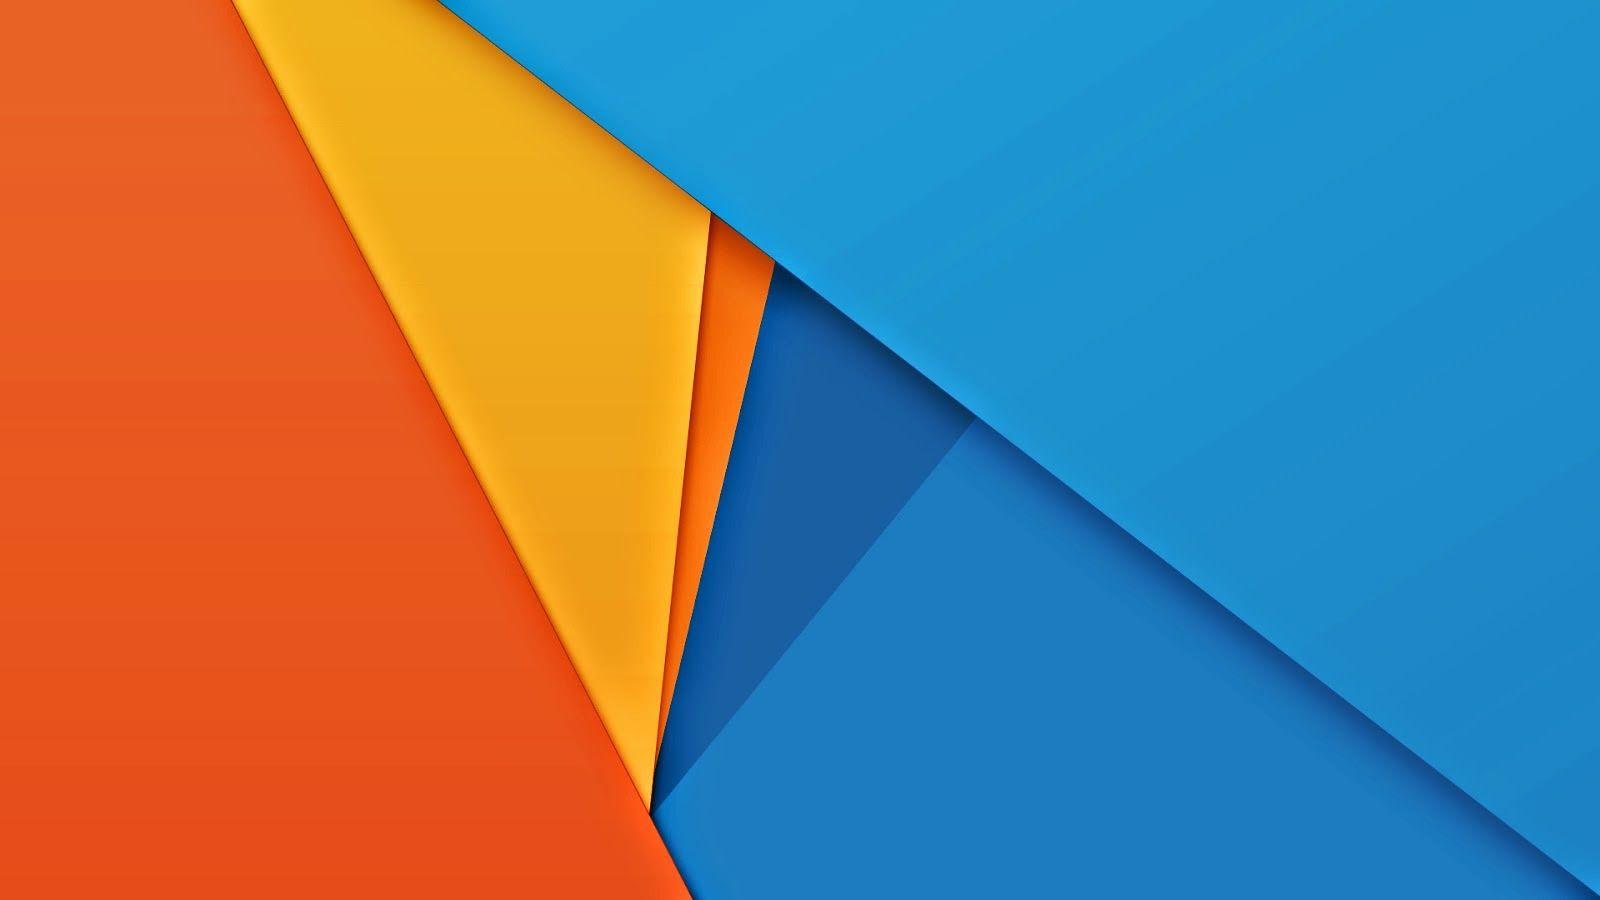 Material Wallpapers Hd: Full Computer Size Material Design Wallpaper